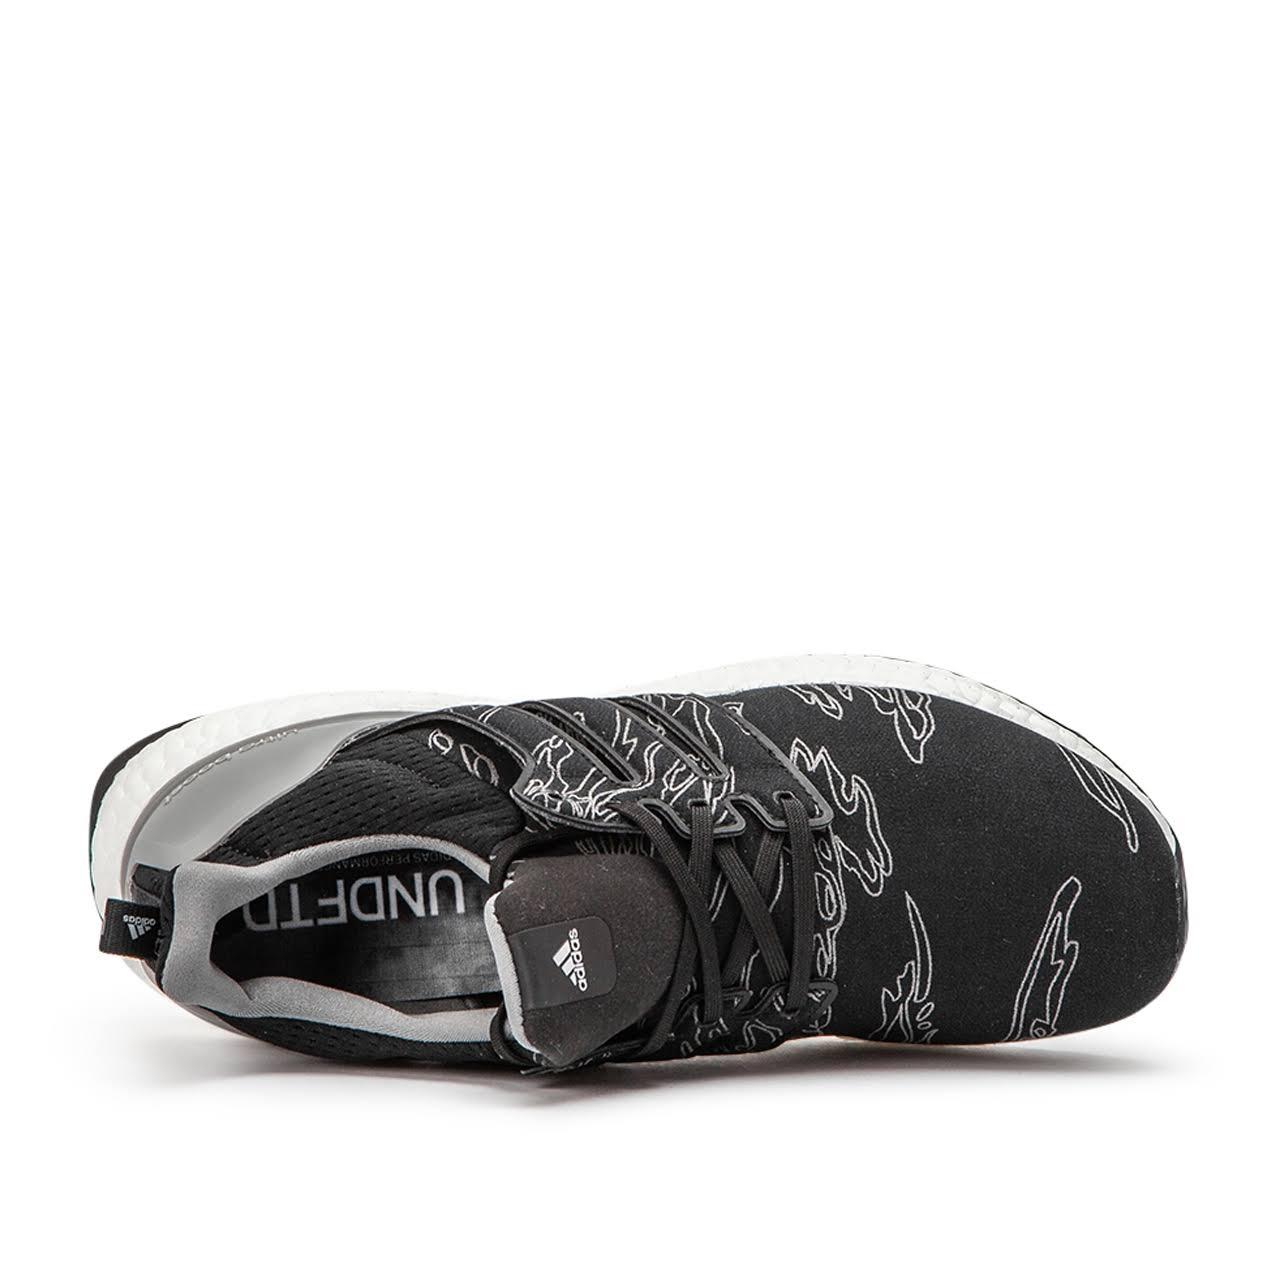 Black X Adidas Core Footwear Ultraboost Co Undftd Originals Color wSYq4xYR